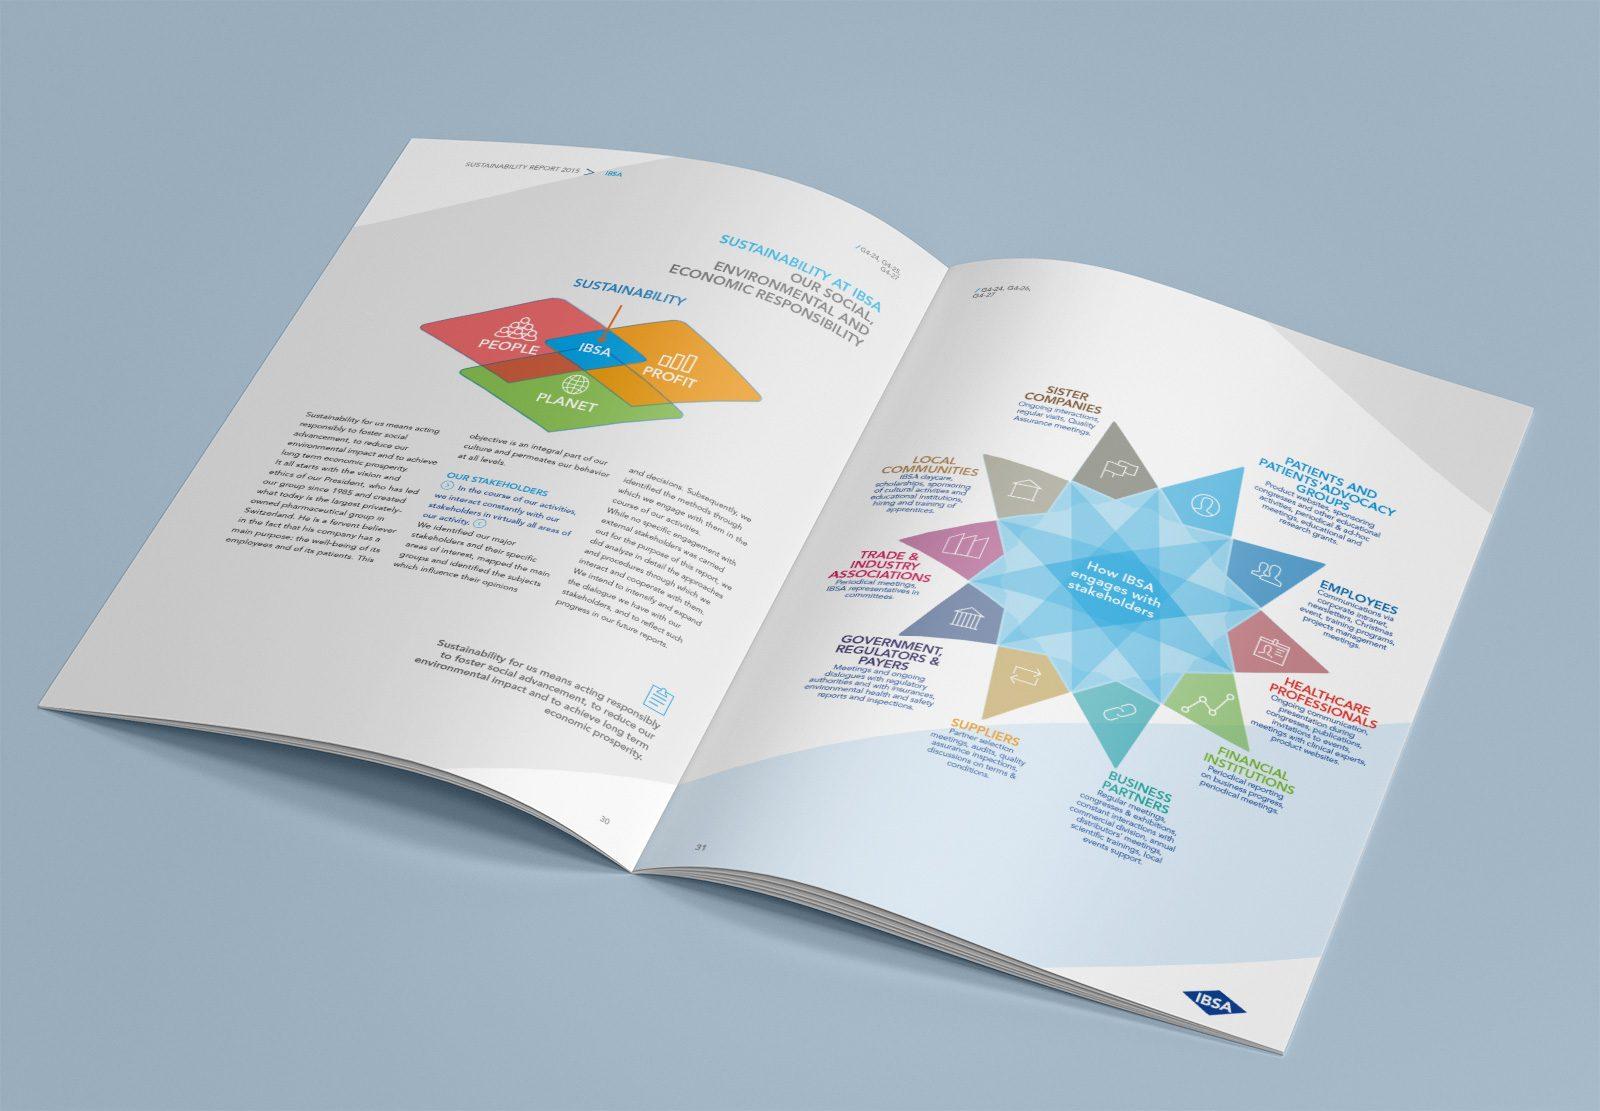 Alberto Sala Design - IBSA Sustainability Report